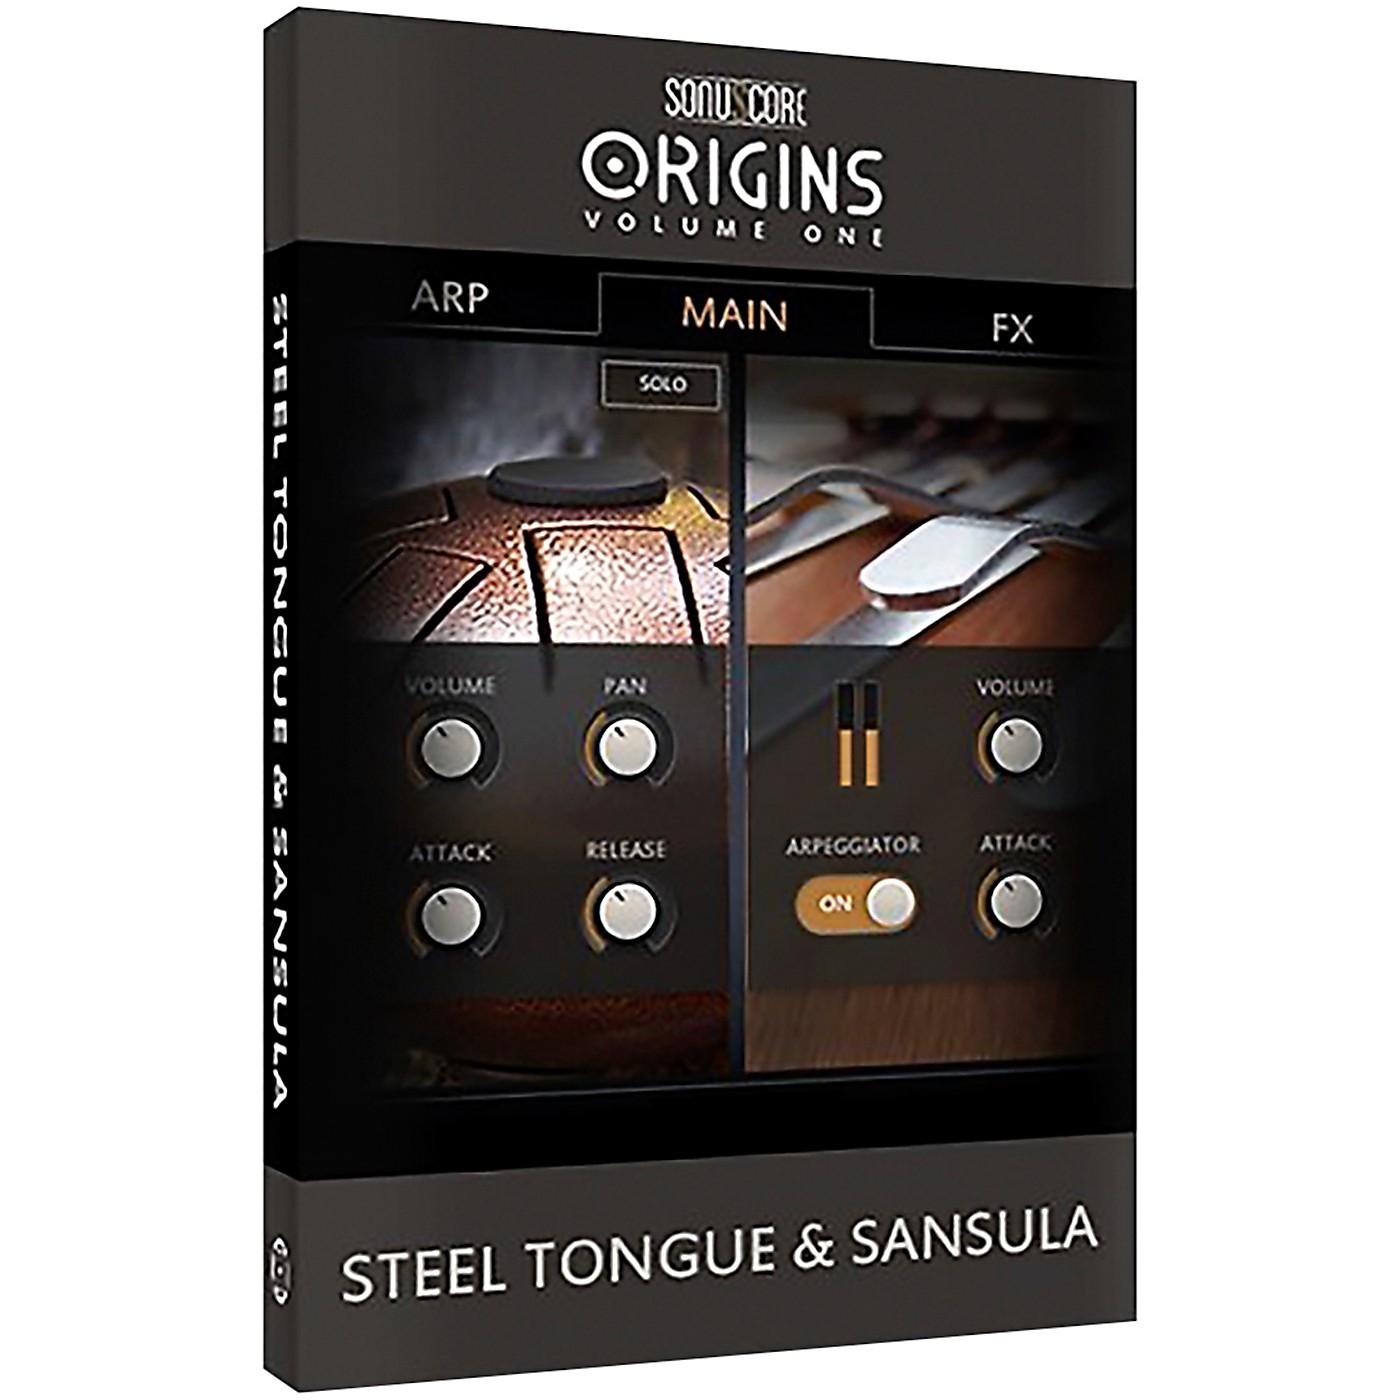 Sonuscore Origins Series Vol. 1 Steel Tongue & Sansula thumbnail